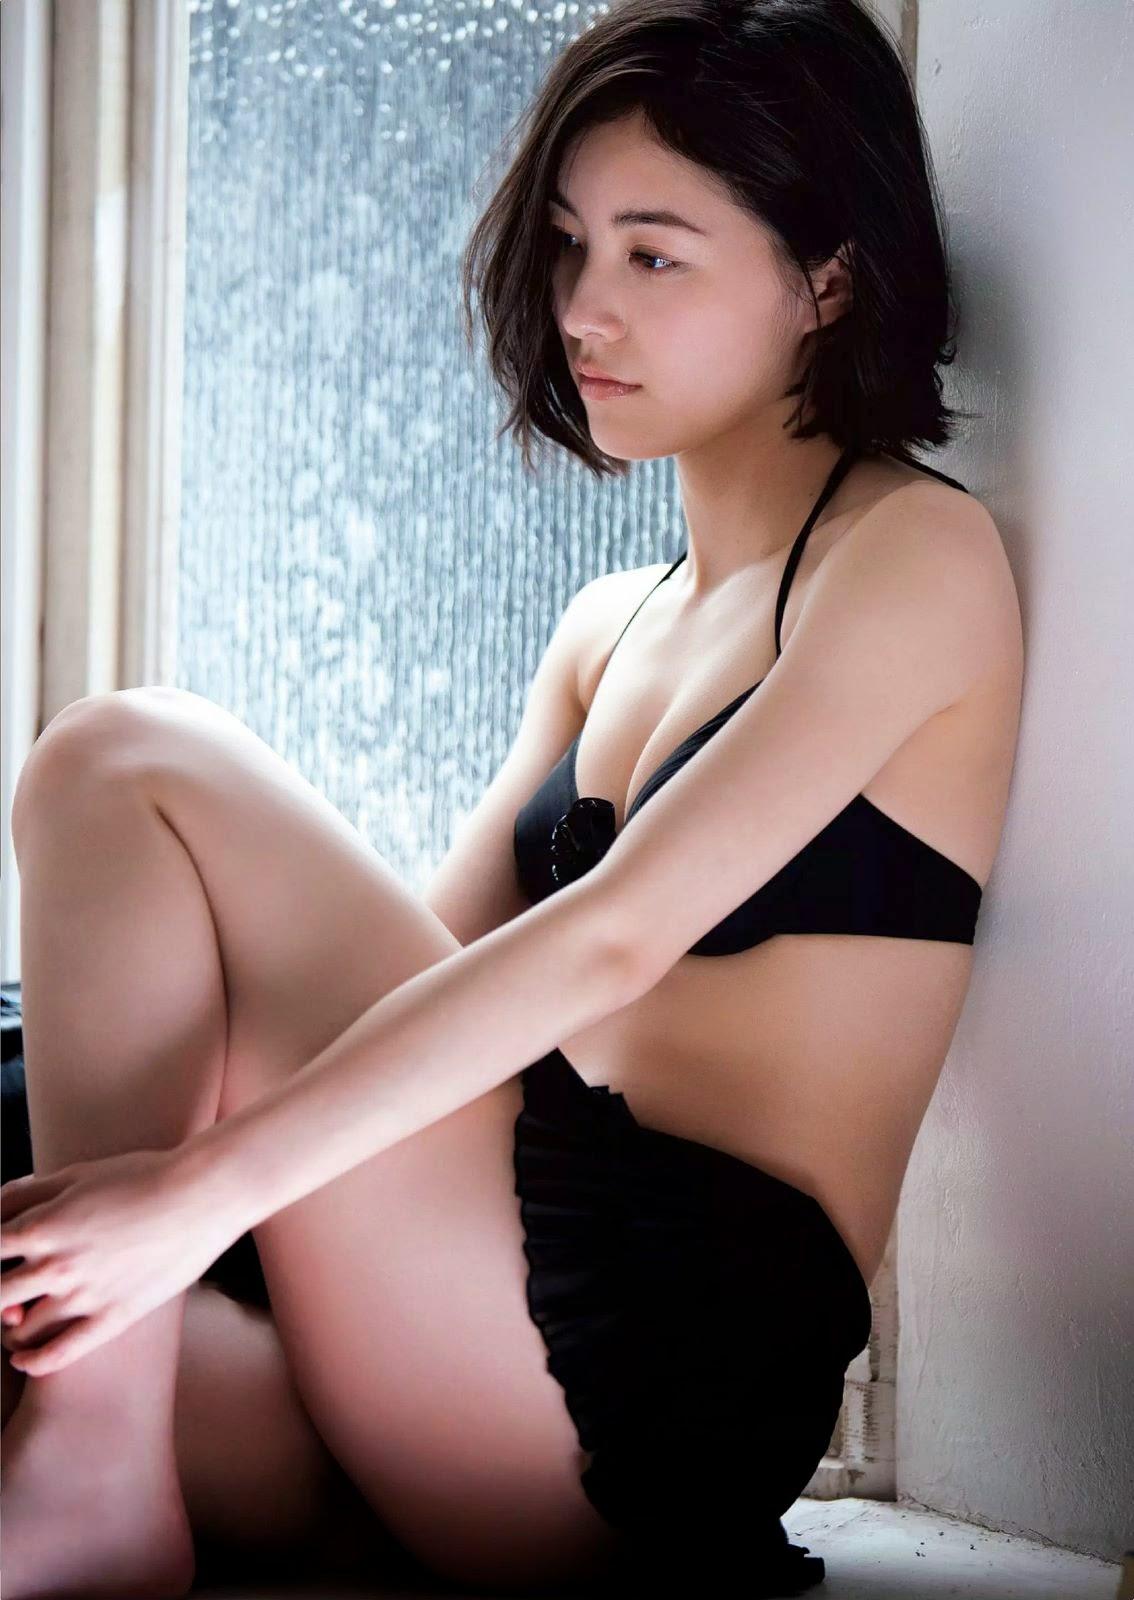 Matsui Jurina 松井珠理奈 18 Years (18歳) Images 5